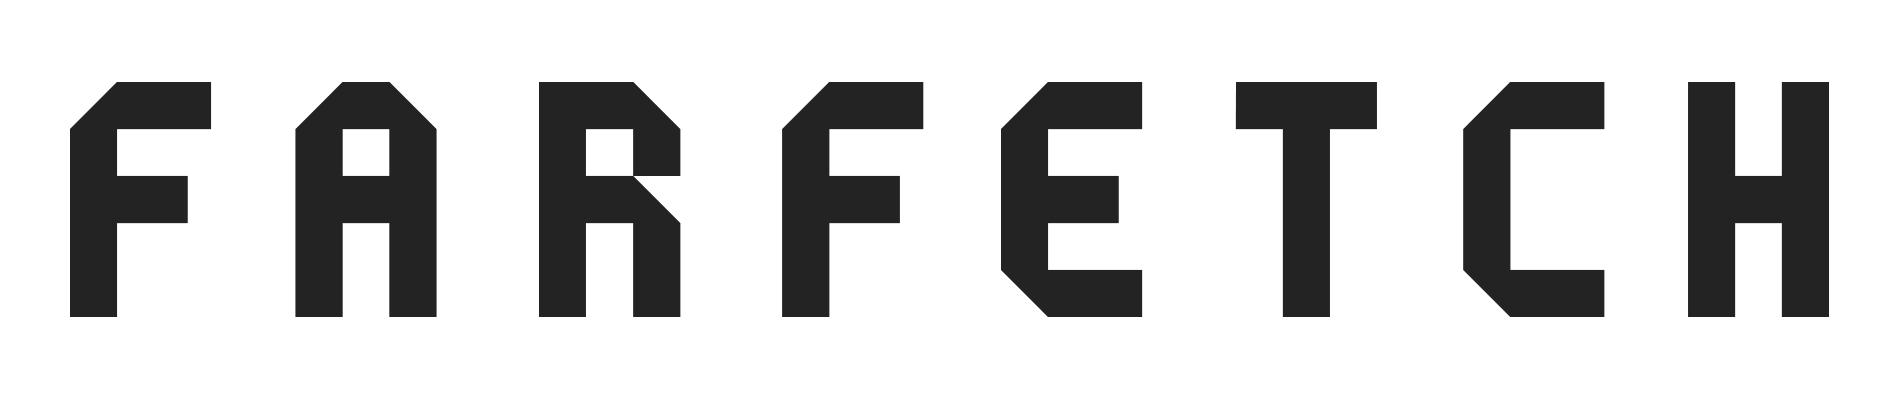 Farfetch官网2020年1月至2月低至8折促销